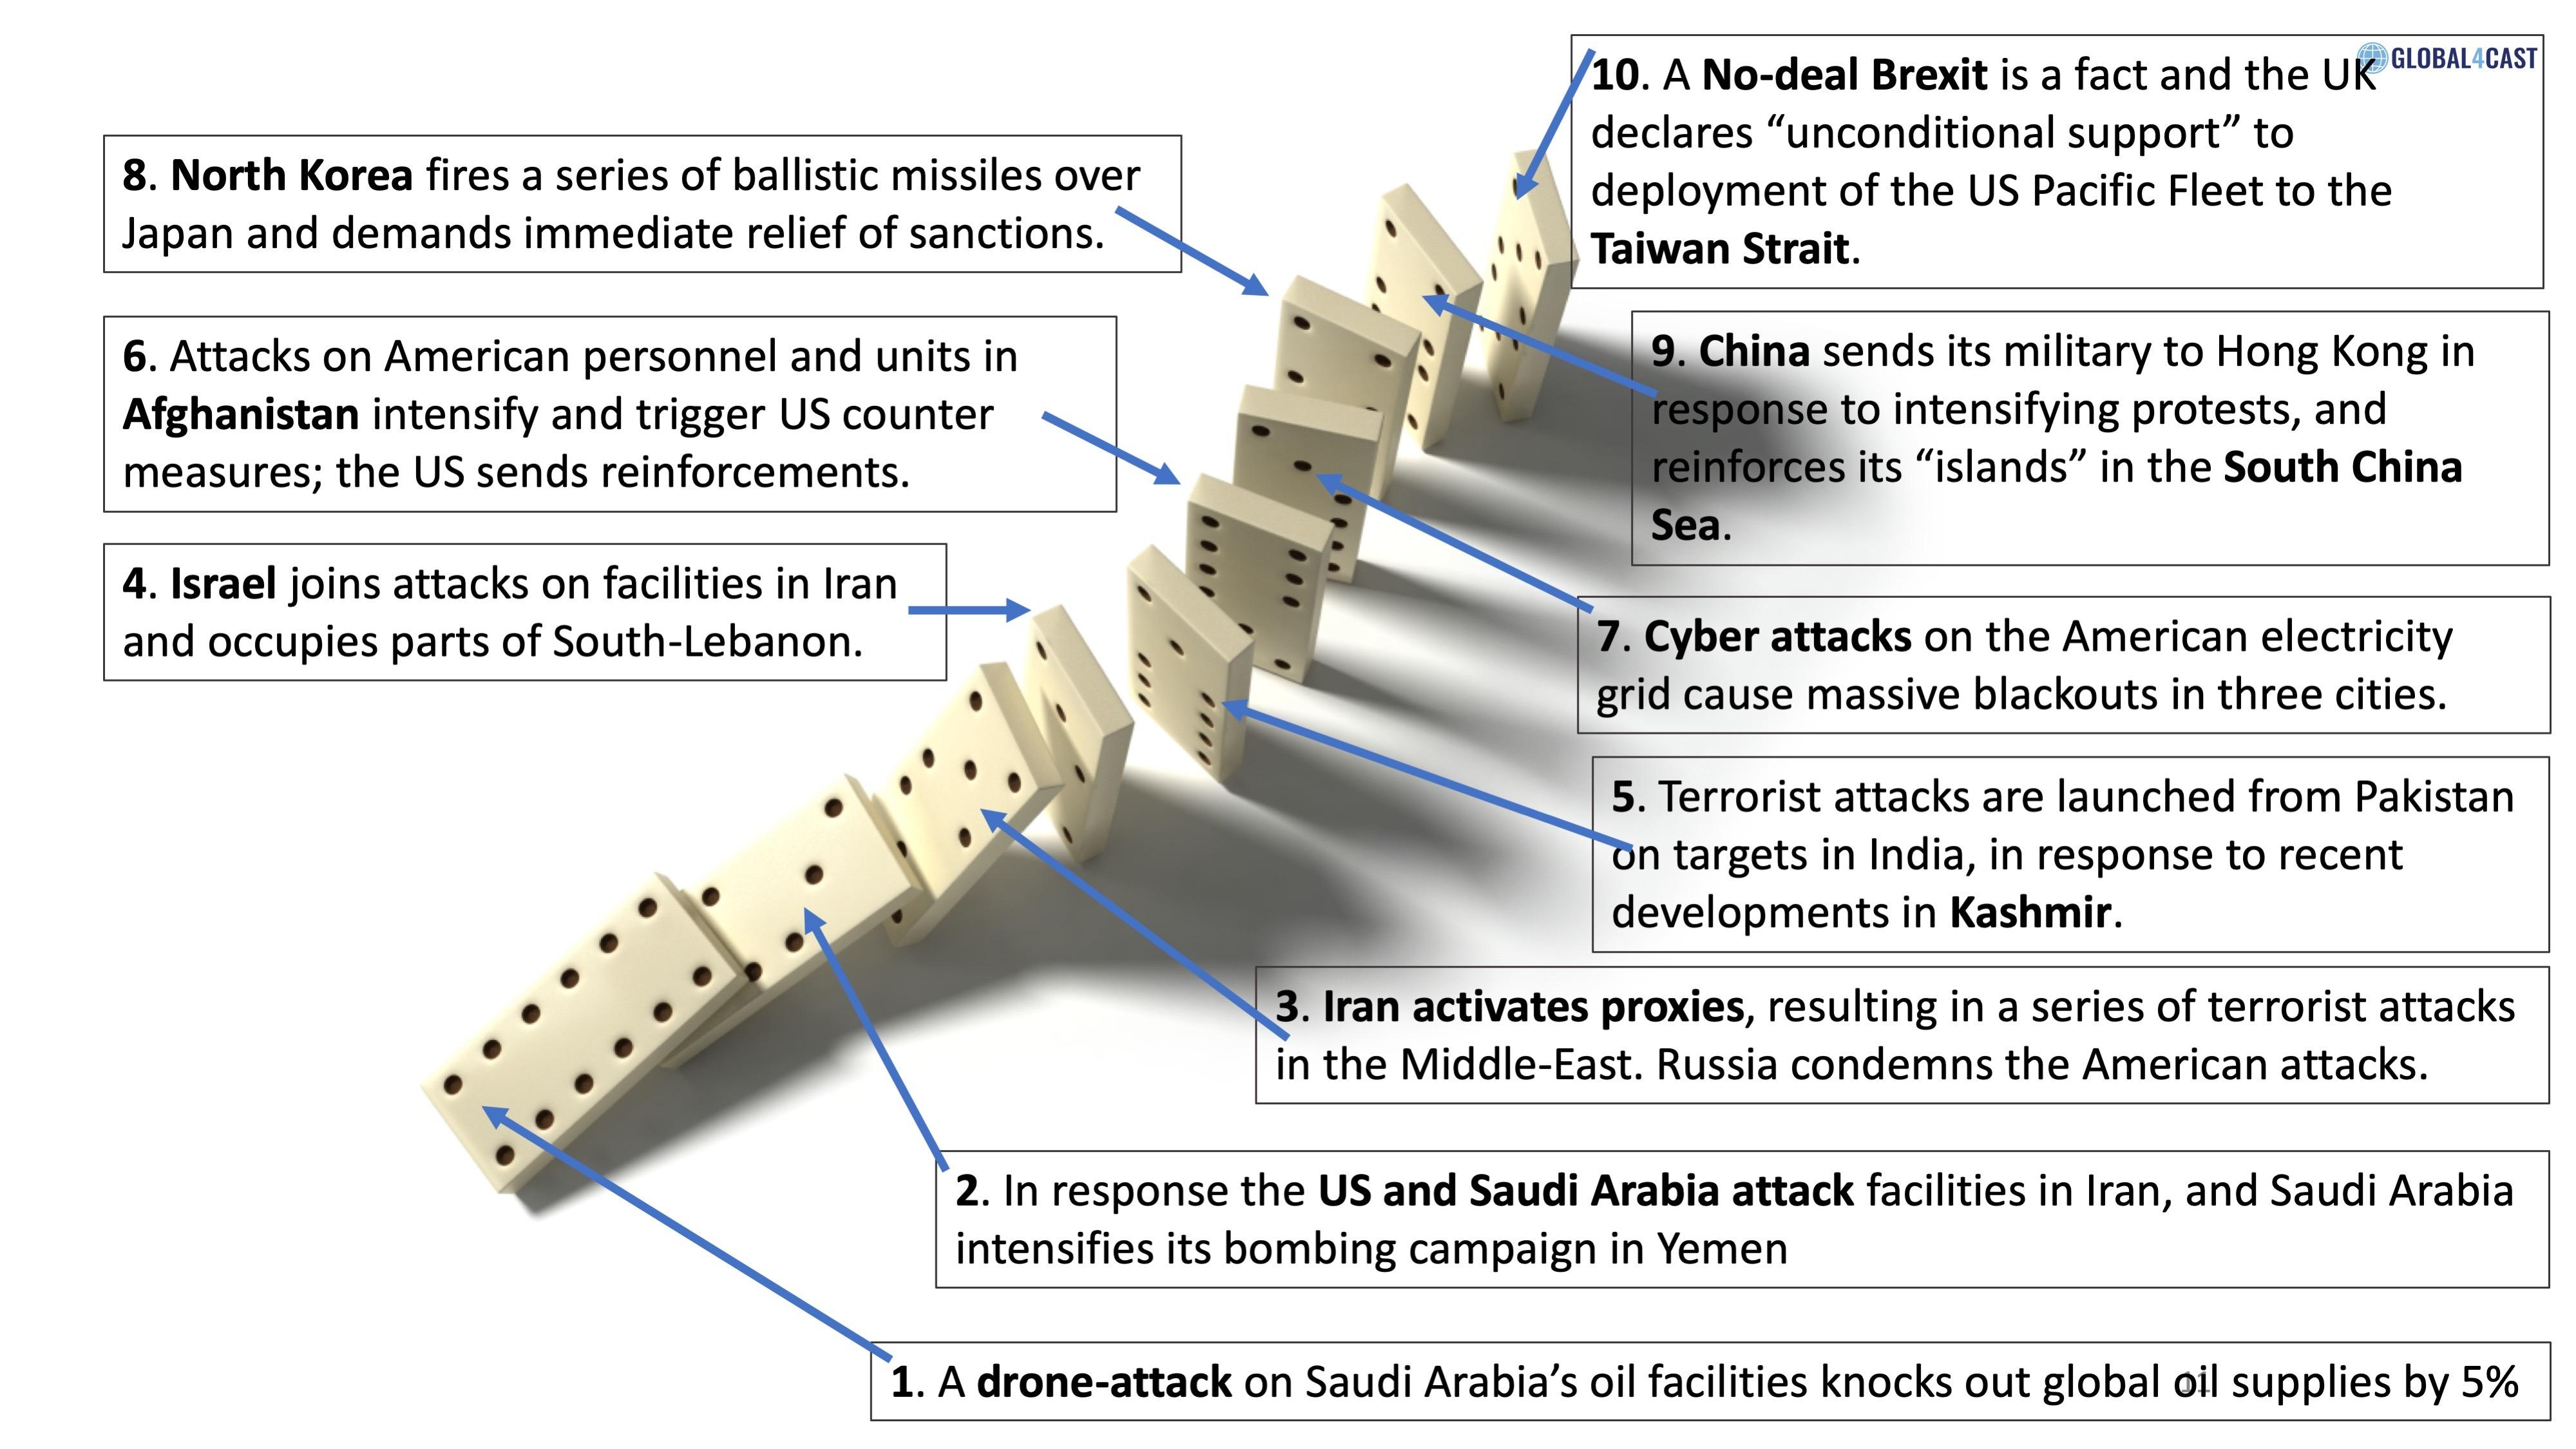 American and Saudi retaliation against Iran can cause a dramatic escalation